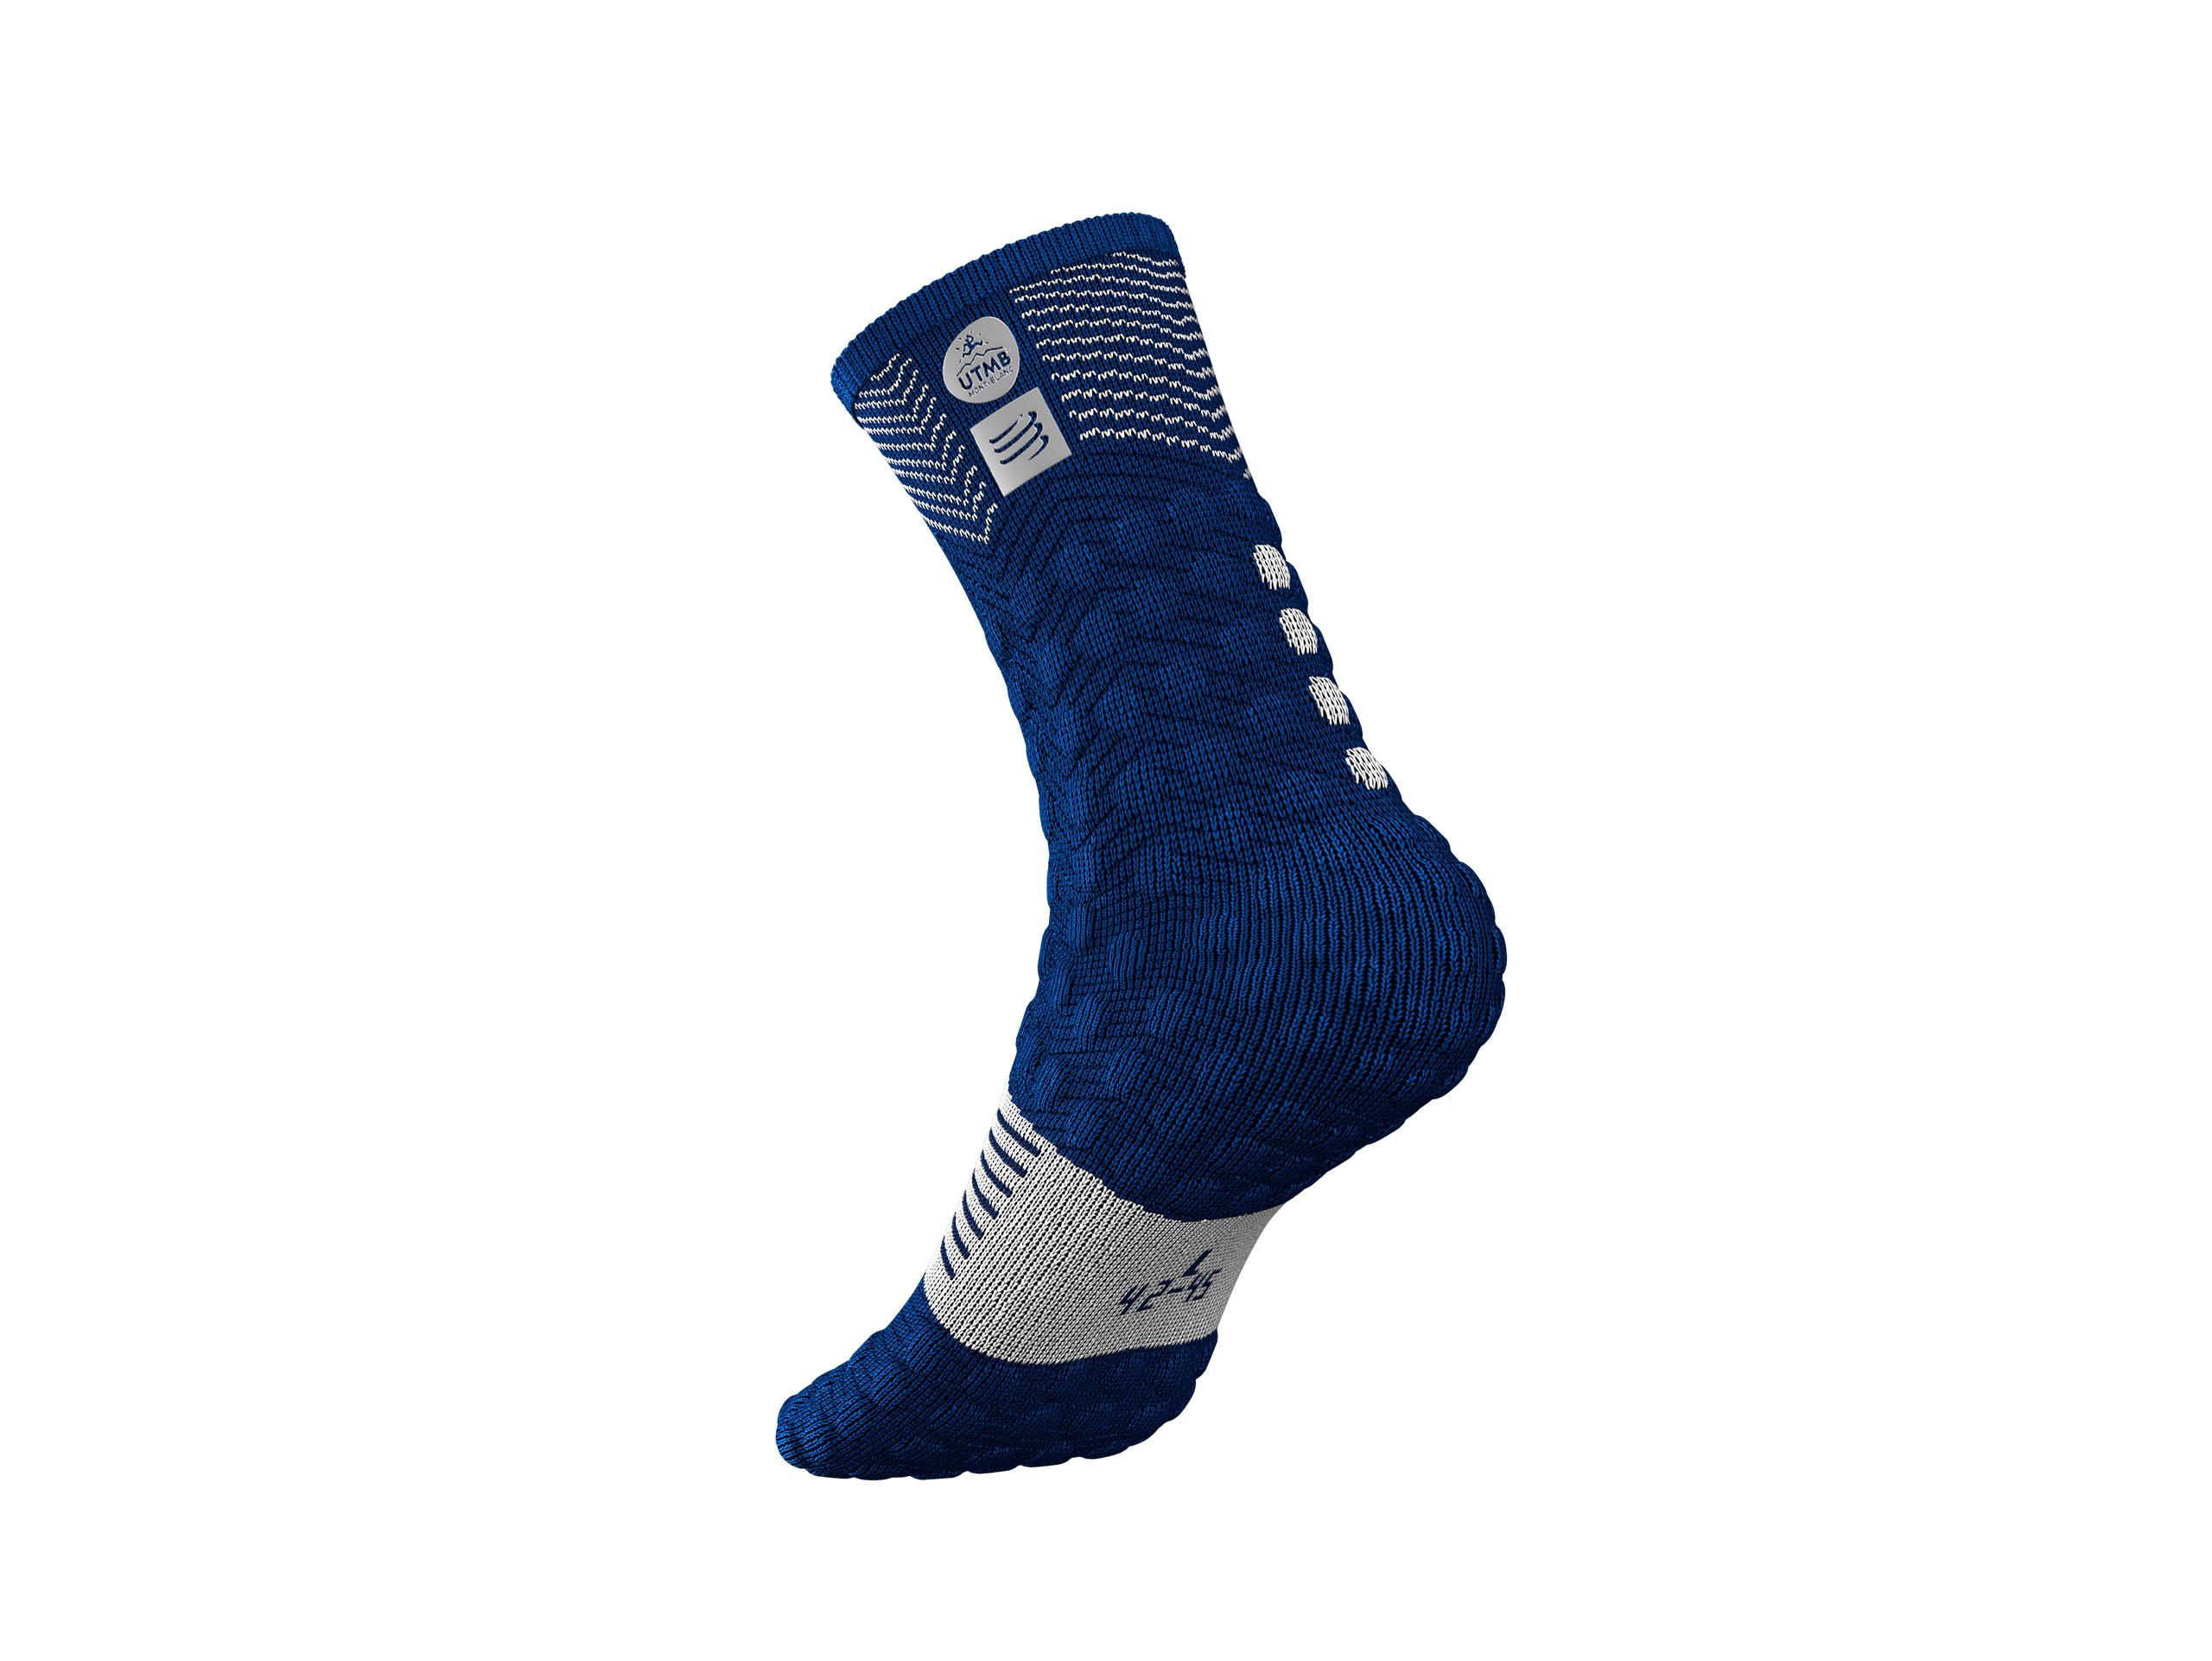 Pro Racing Socks v3.0 Ultra Trail - UTMB 2019 BLUE